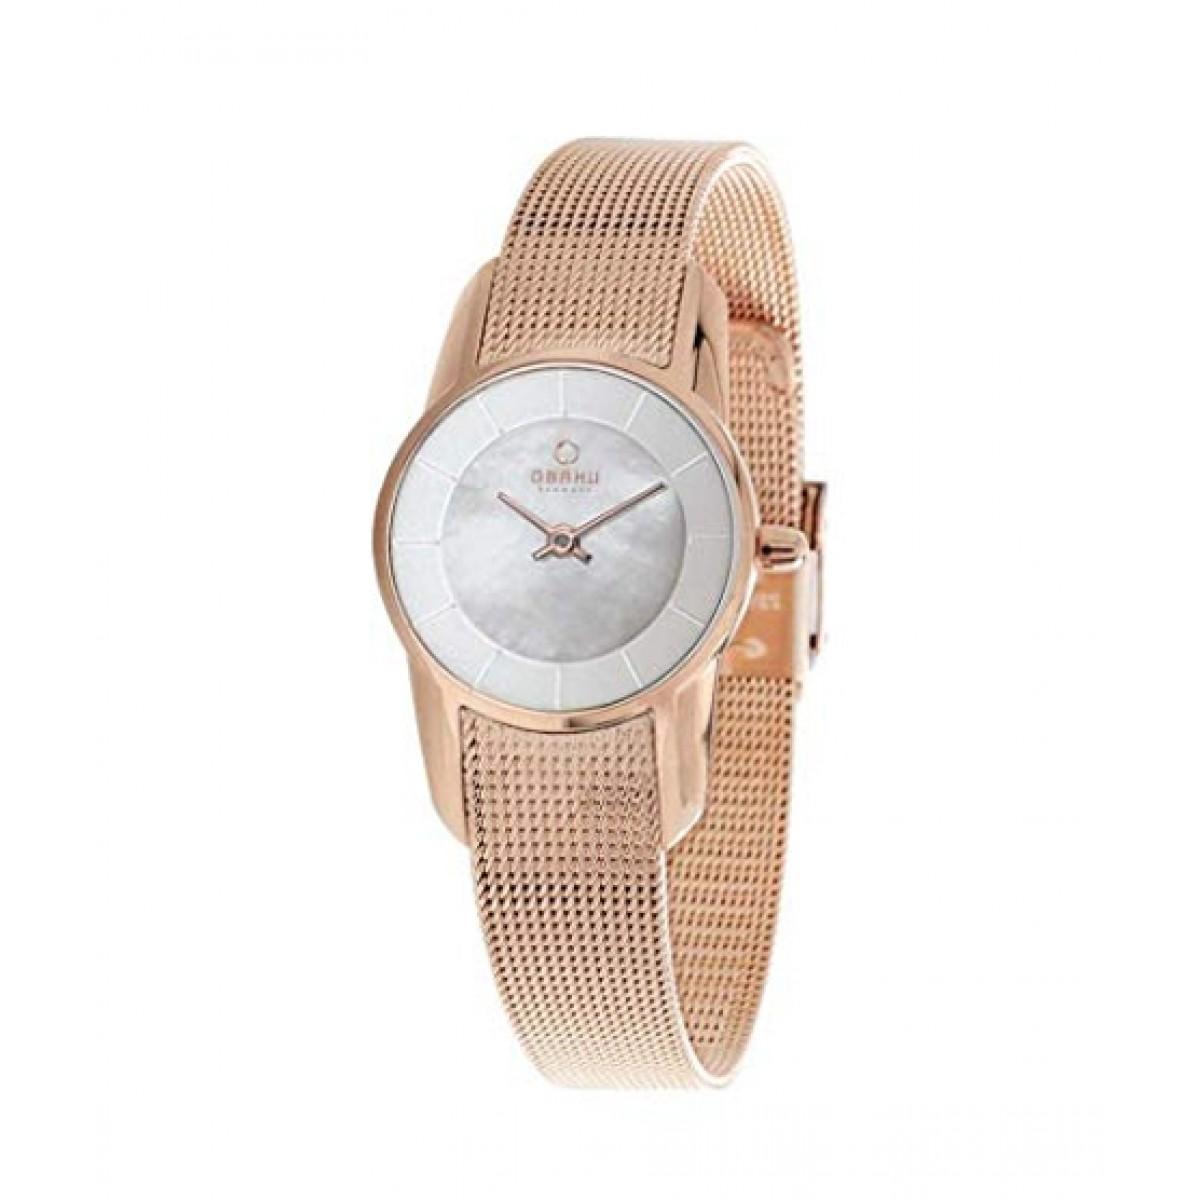 Obaku Quartz Women's Watch Rose Gold (V130LXVWMV)